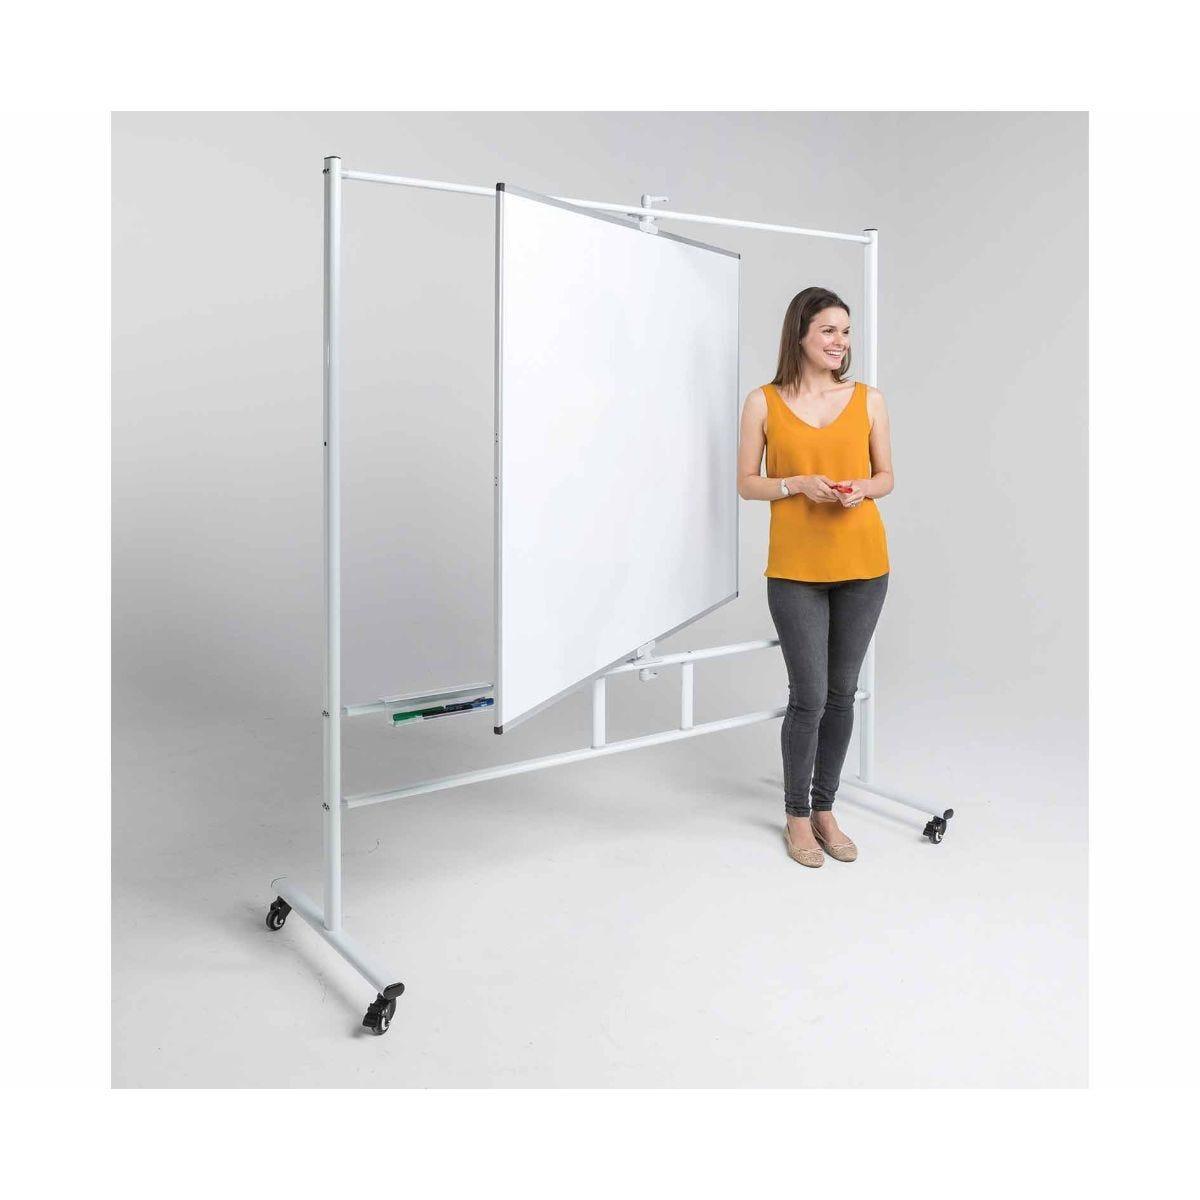 Metroplan WriteAngle Magnetic Revolving Whiteboard 900 x 1200mm